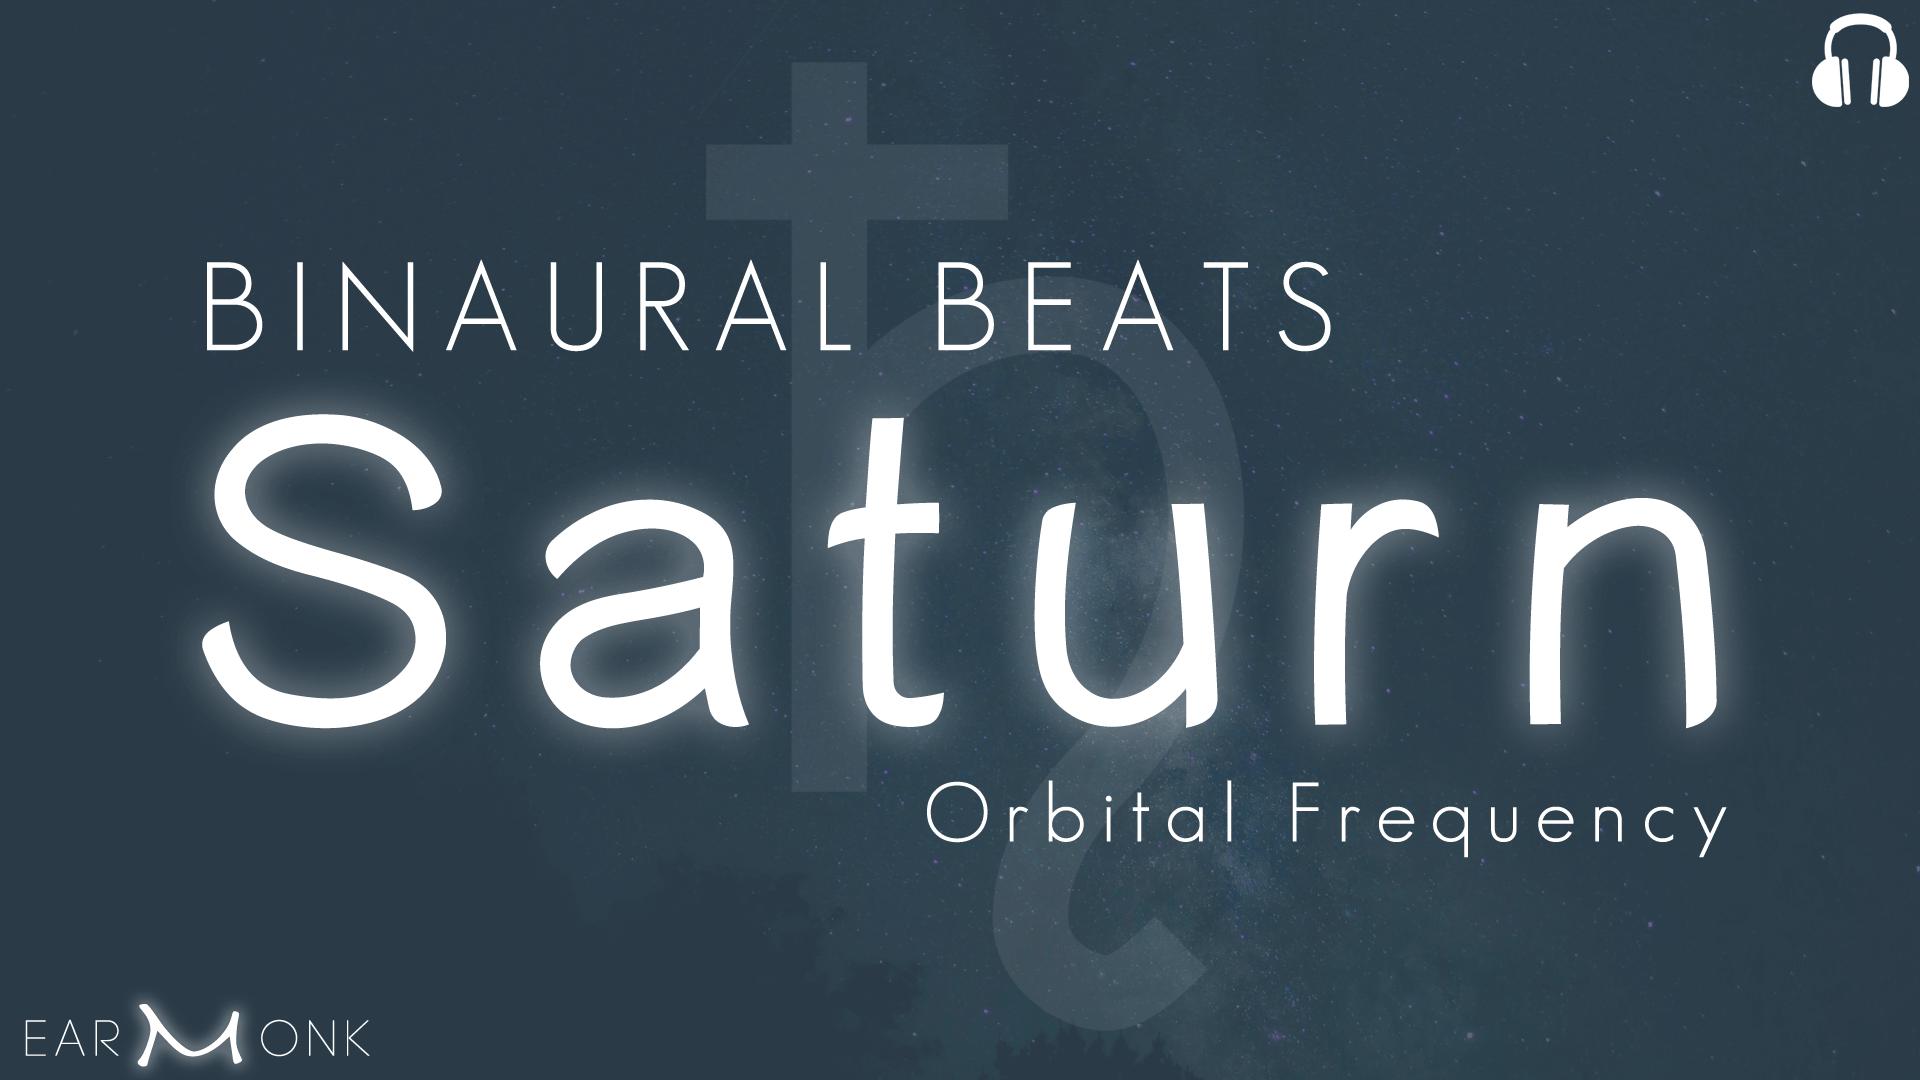 binaural beats saturn frequency